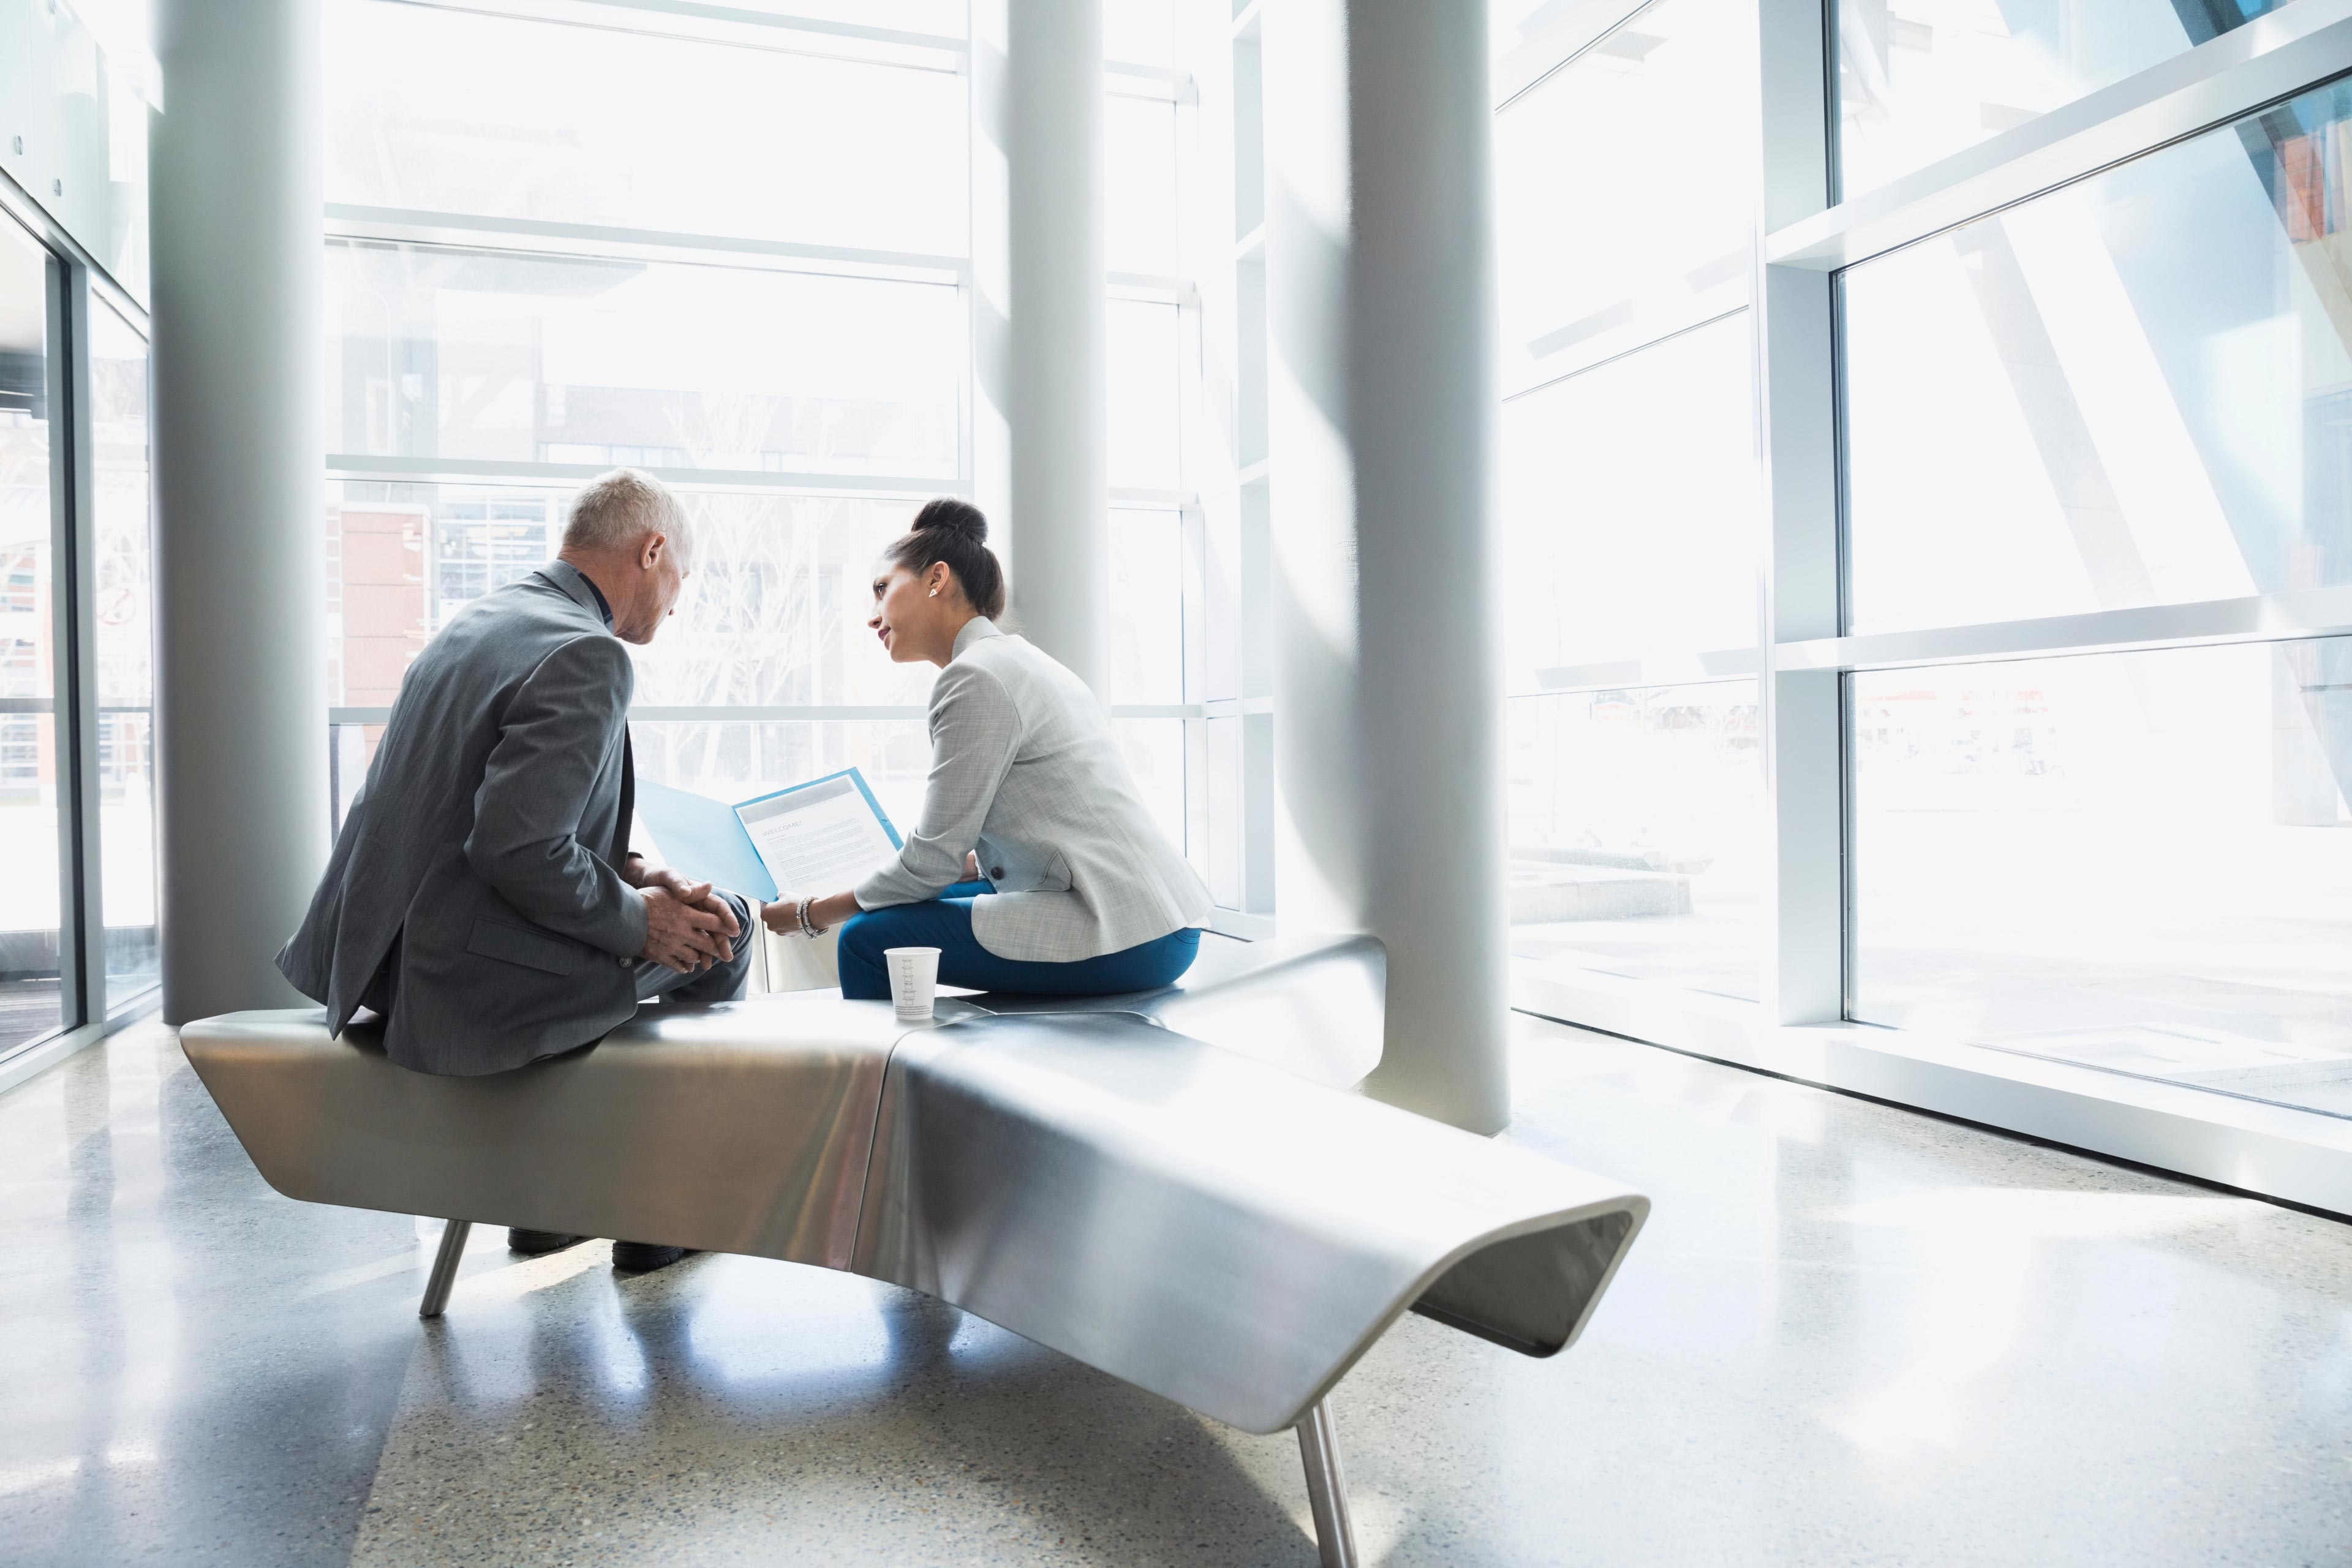 Two people talking in lobby